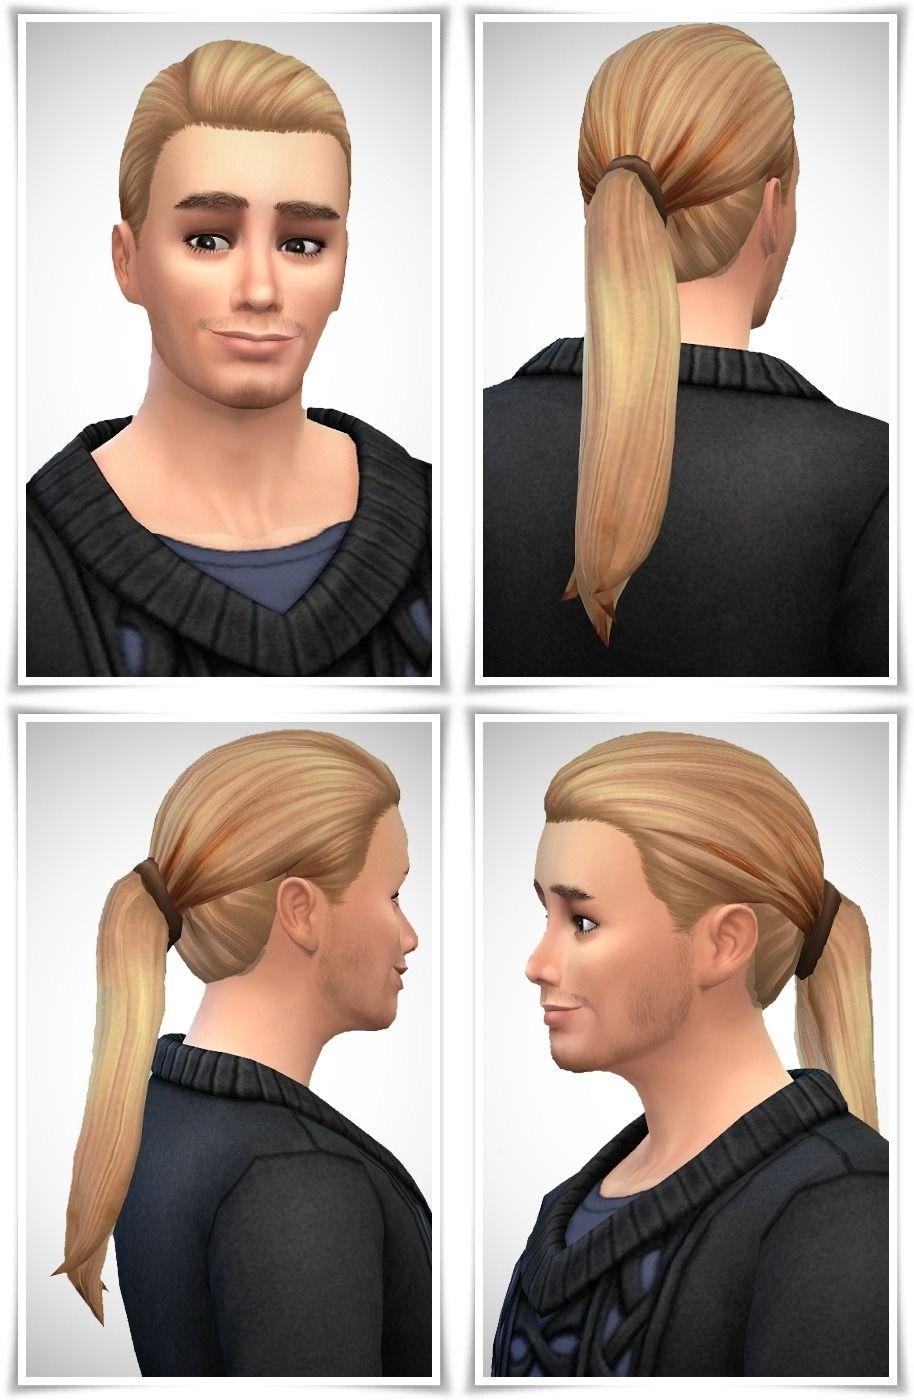 GentsLongPonytail | Ponytail hairstyles, Long ponytails, Hair styles